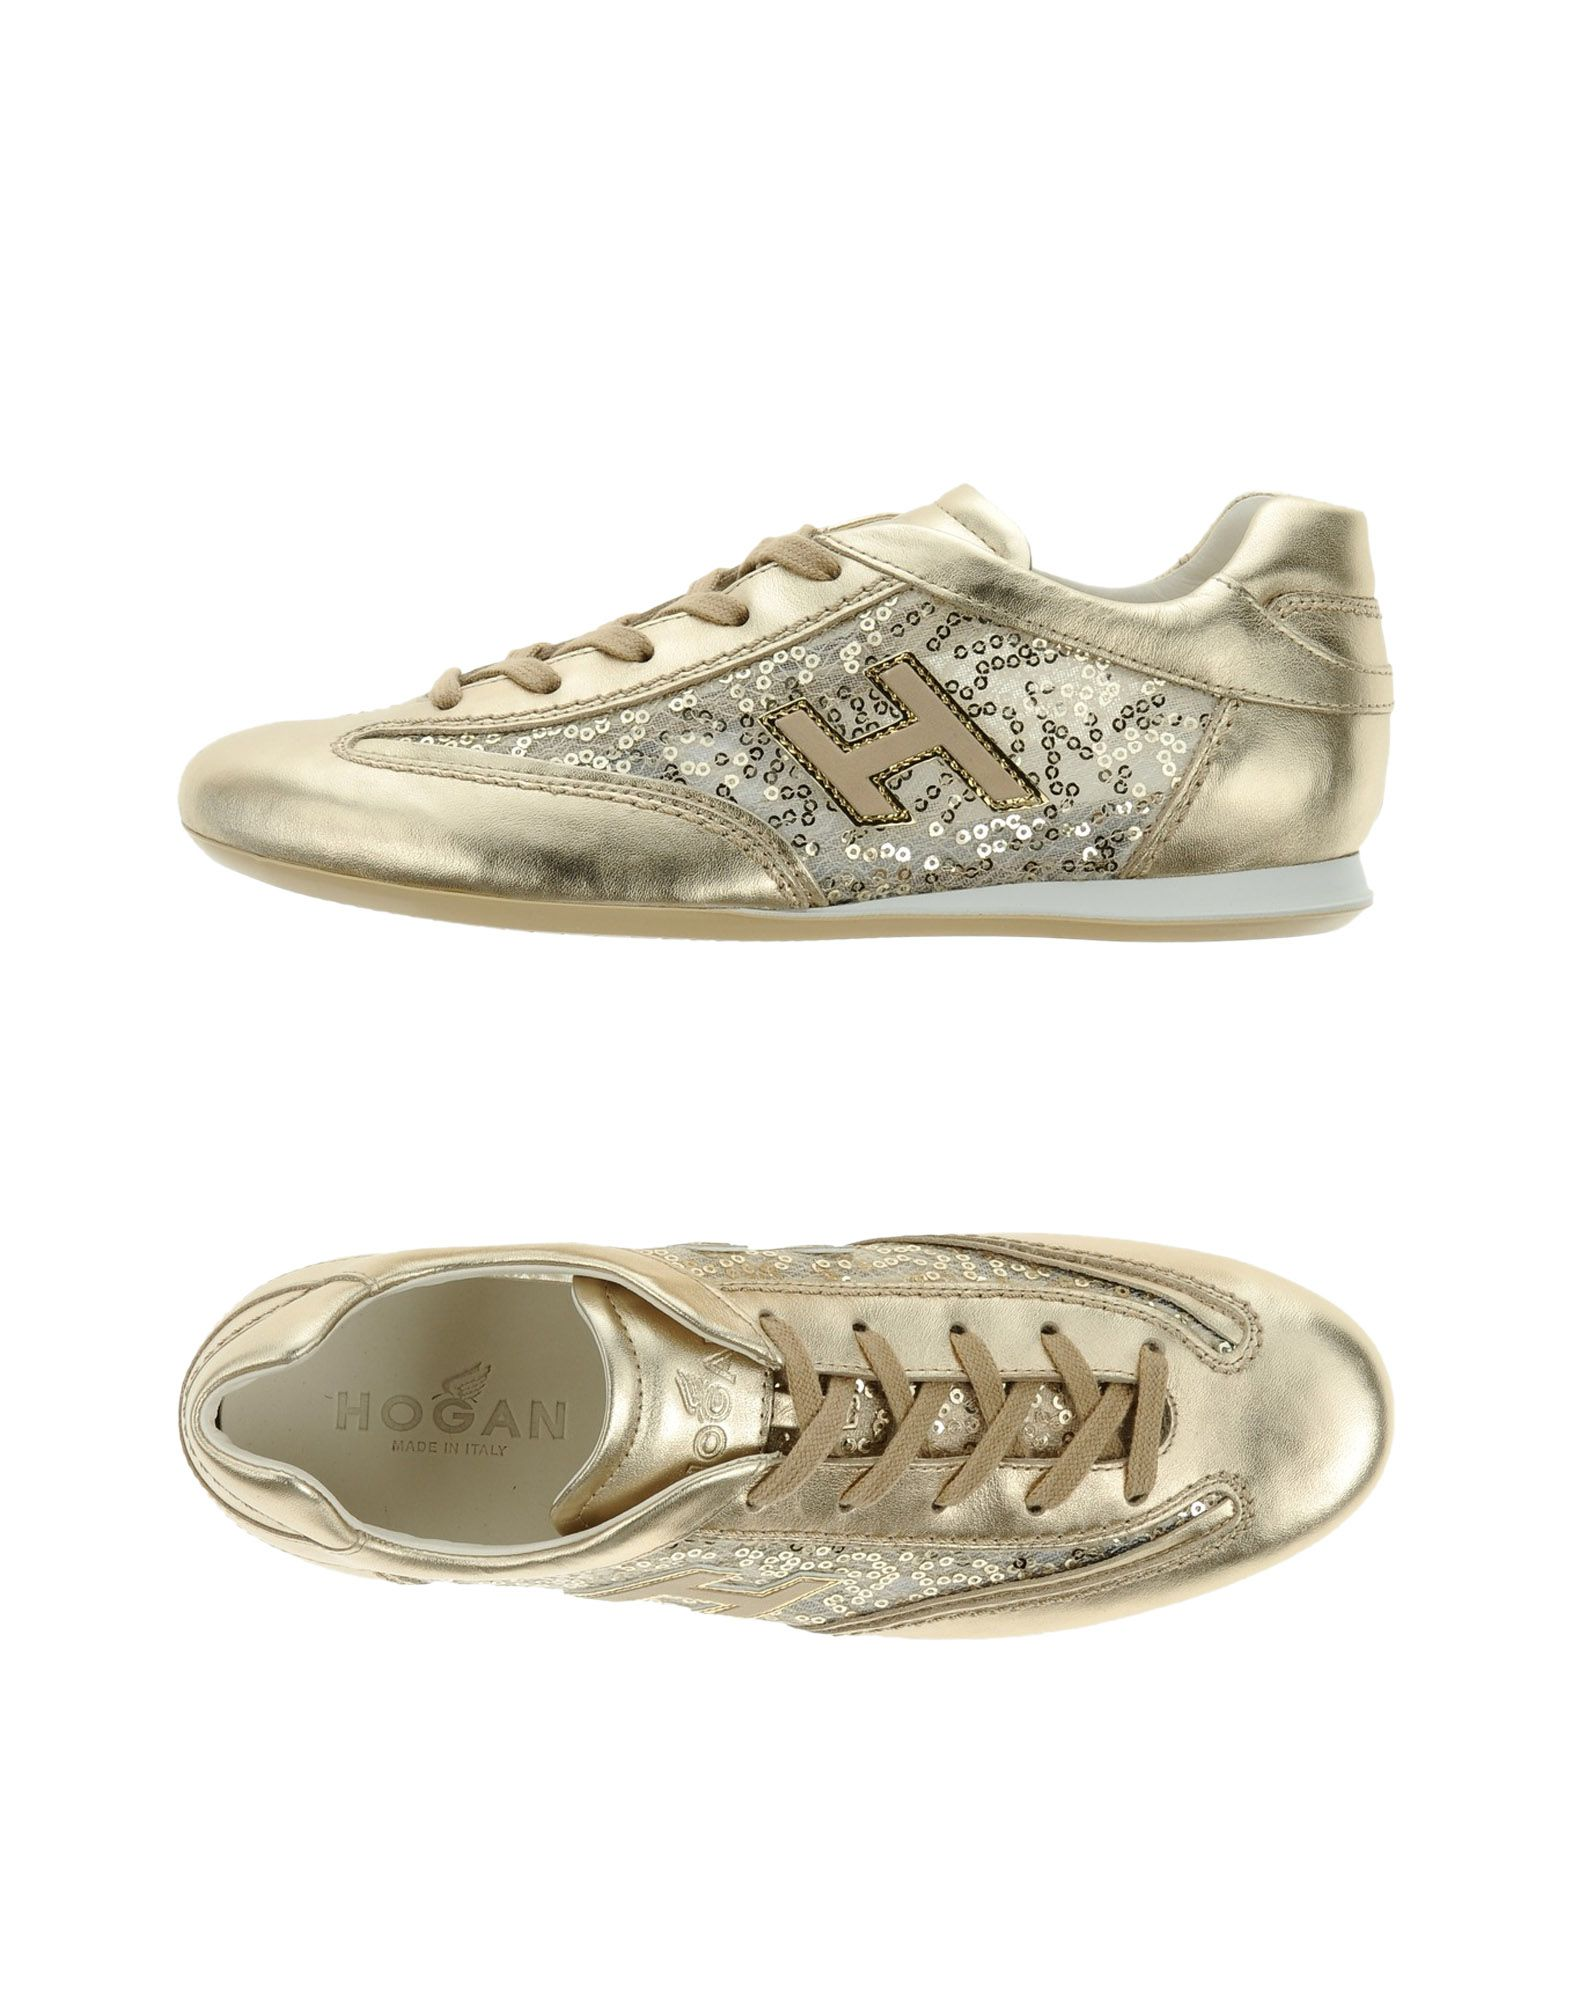 Hogan Sneakers Schuhe Damen  11335671LH Heiße Schuhe Sneakers b5f3a4